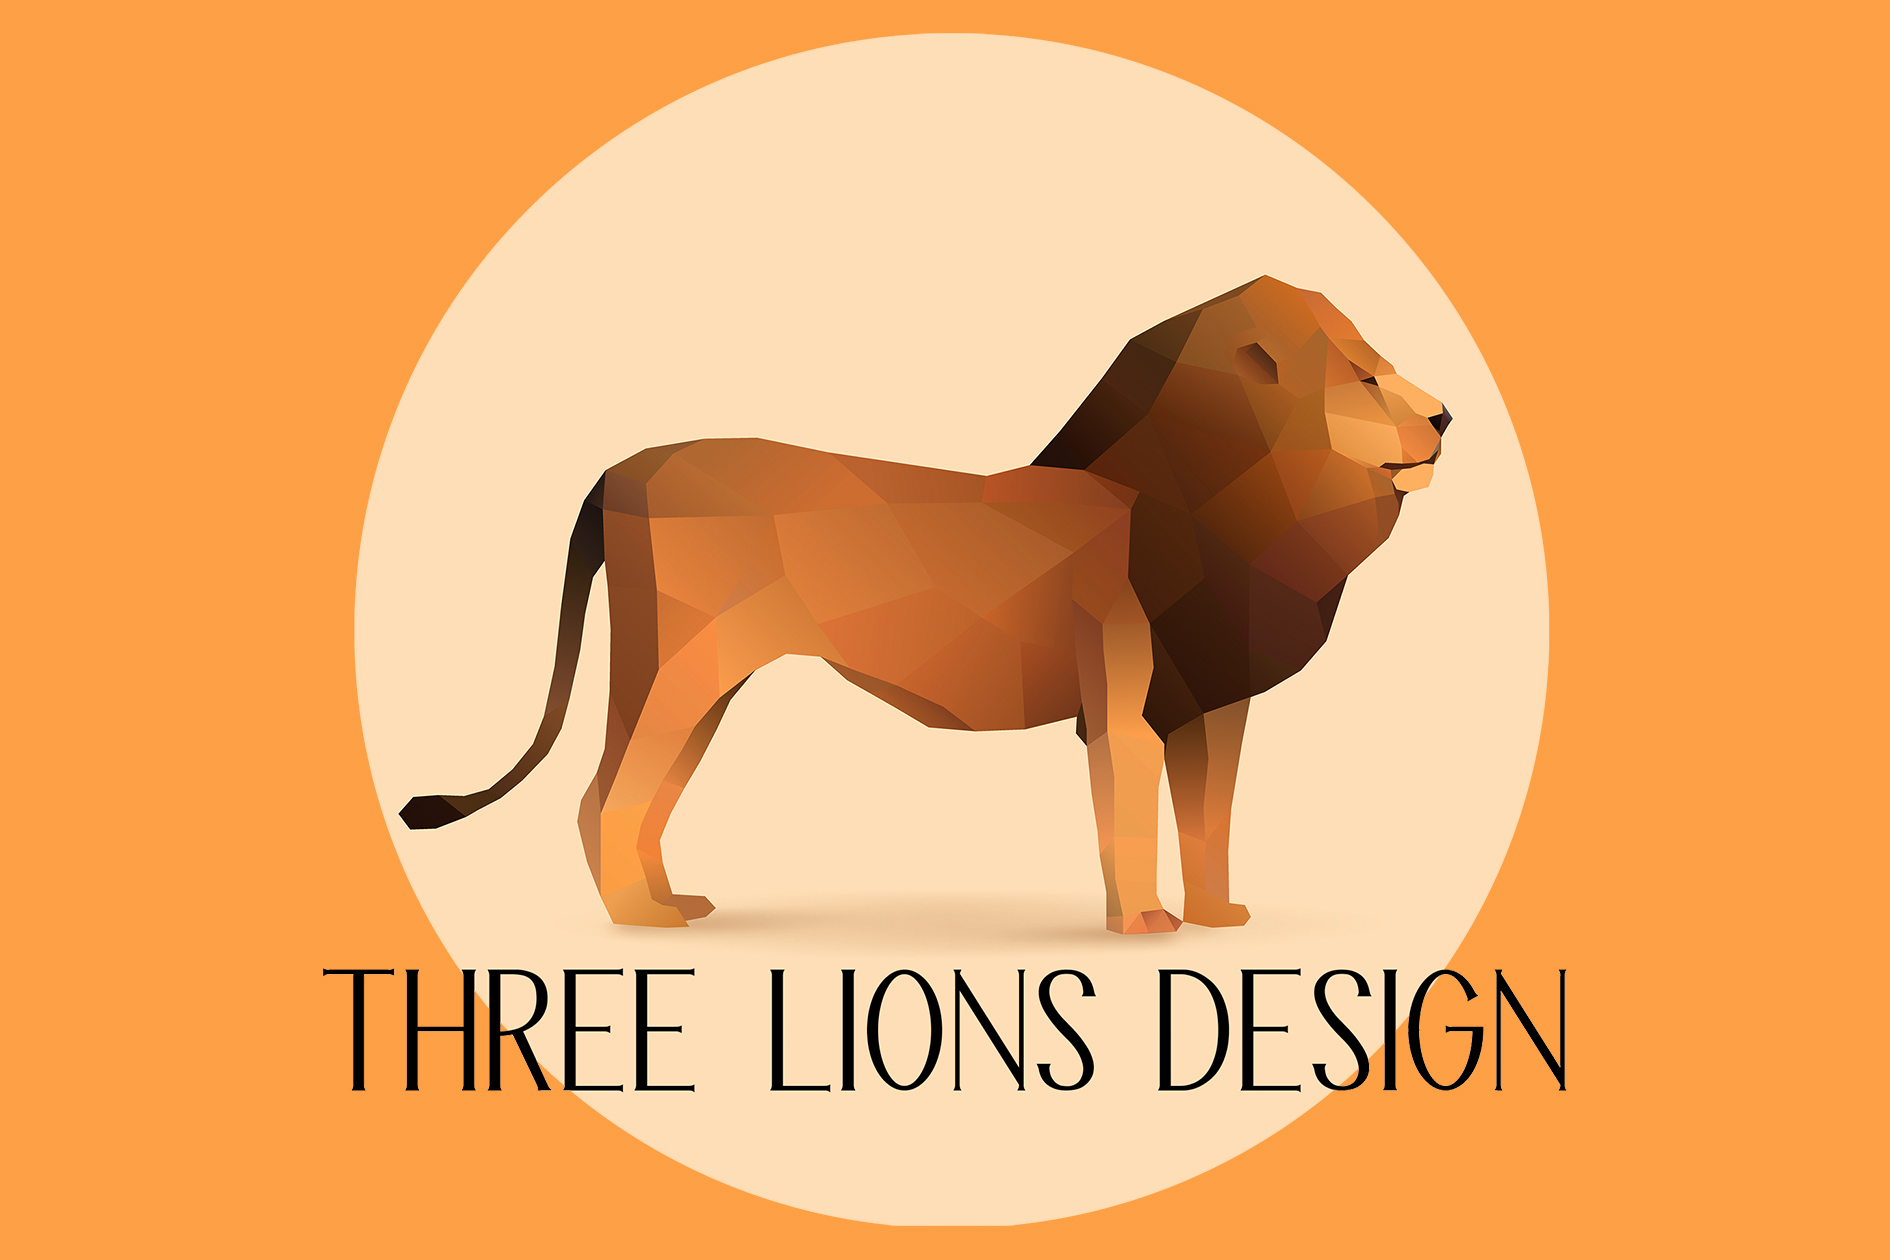 jason-b-graham-three-lions-design